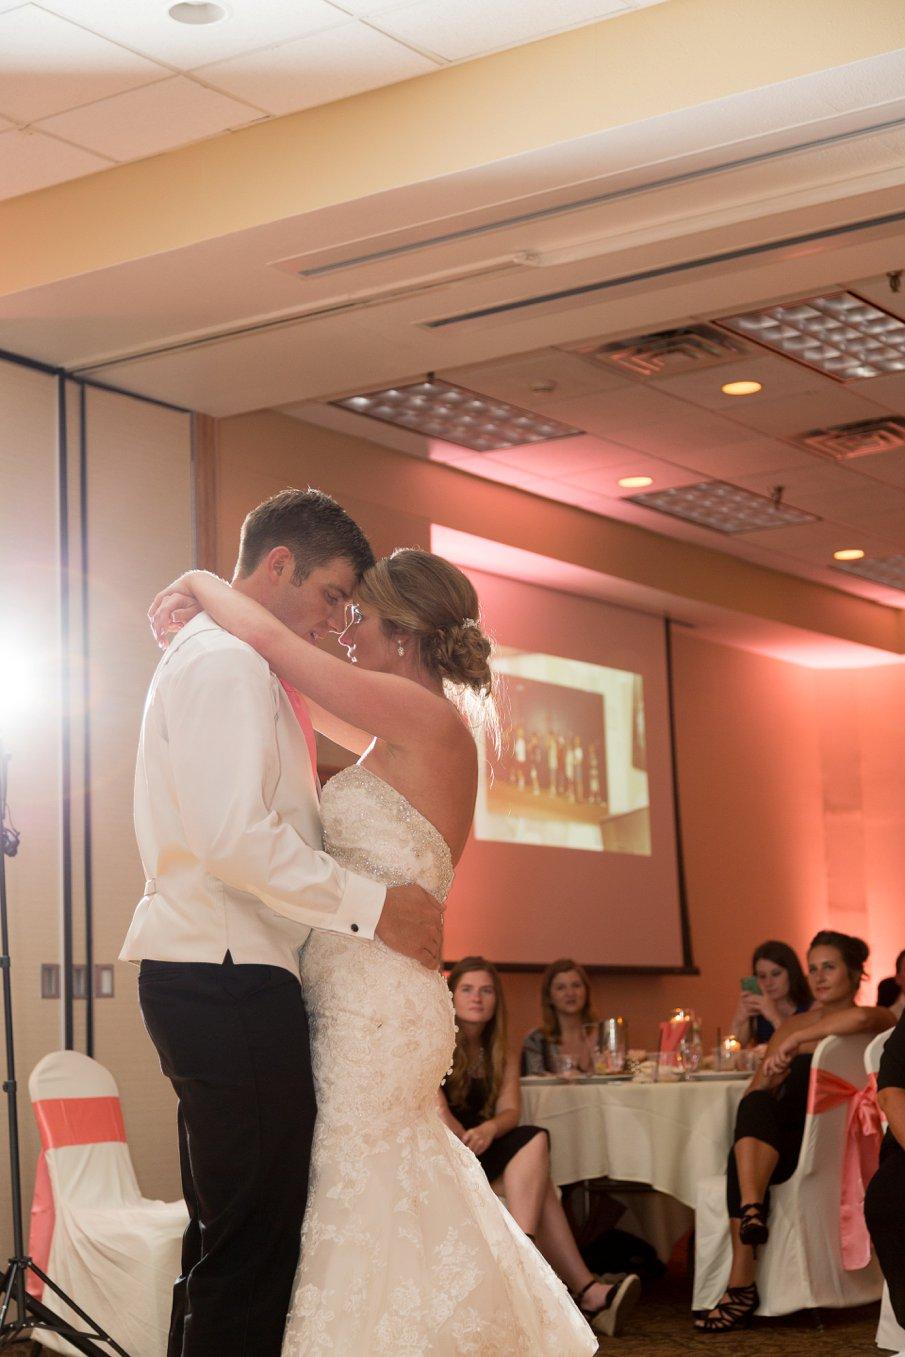 Alice Hq Photography |Courtney + Tyler Mankato MN Wedding19.jpg